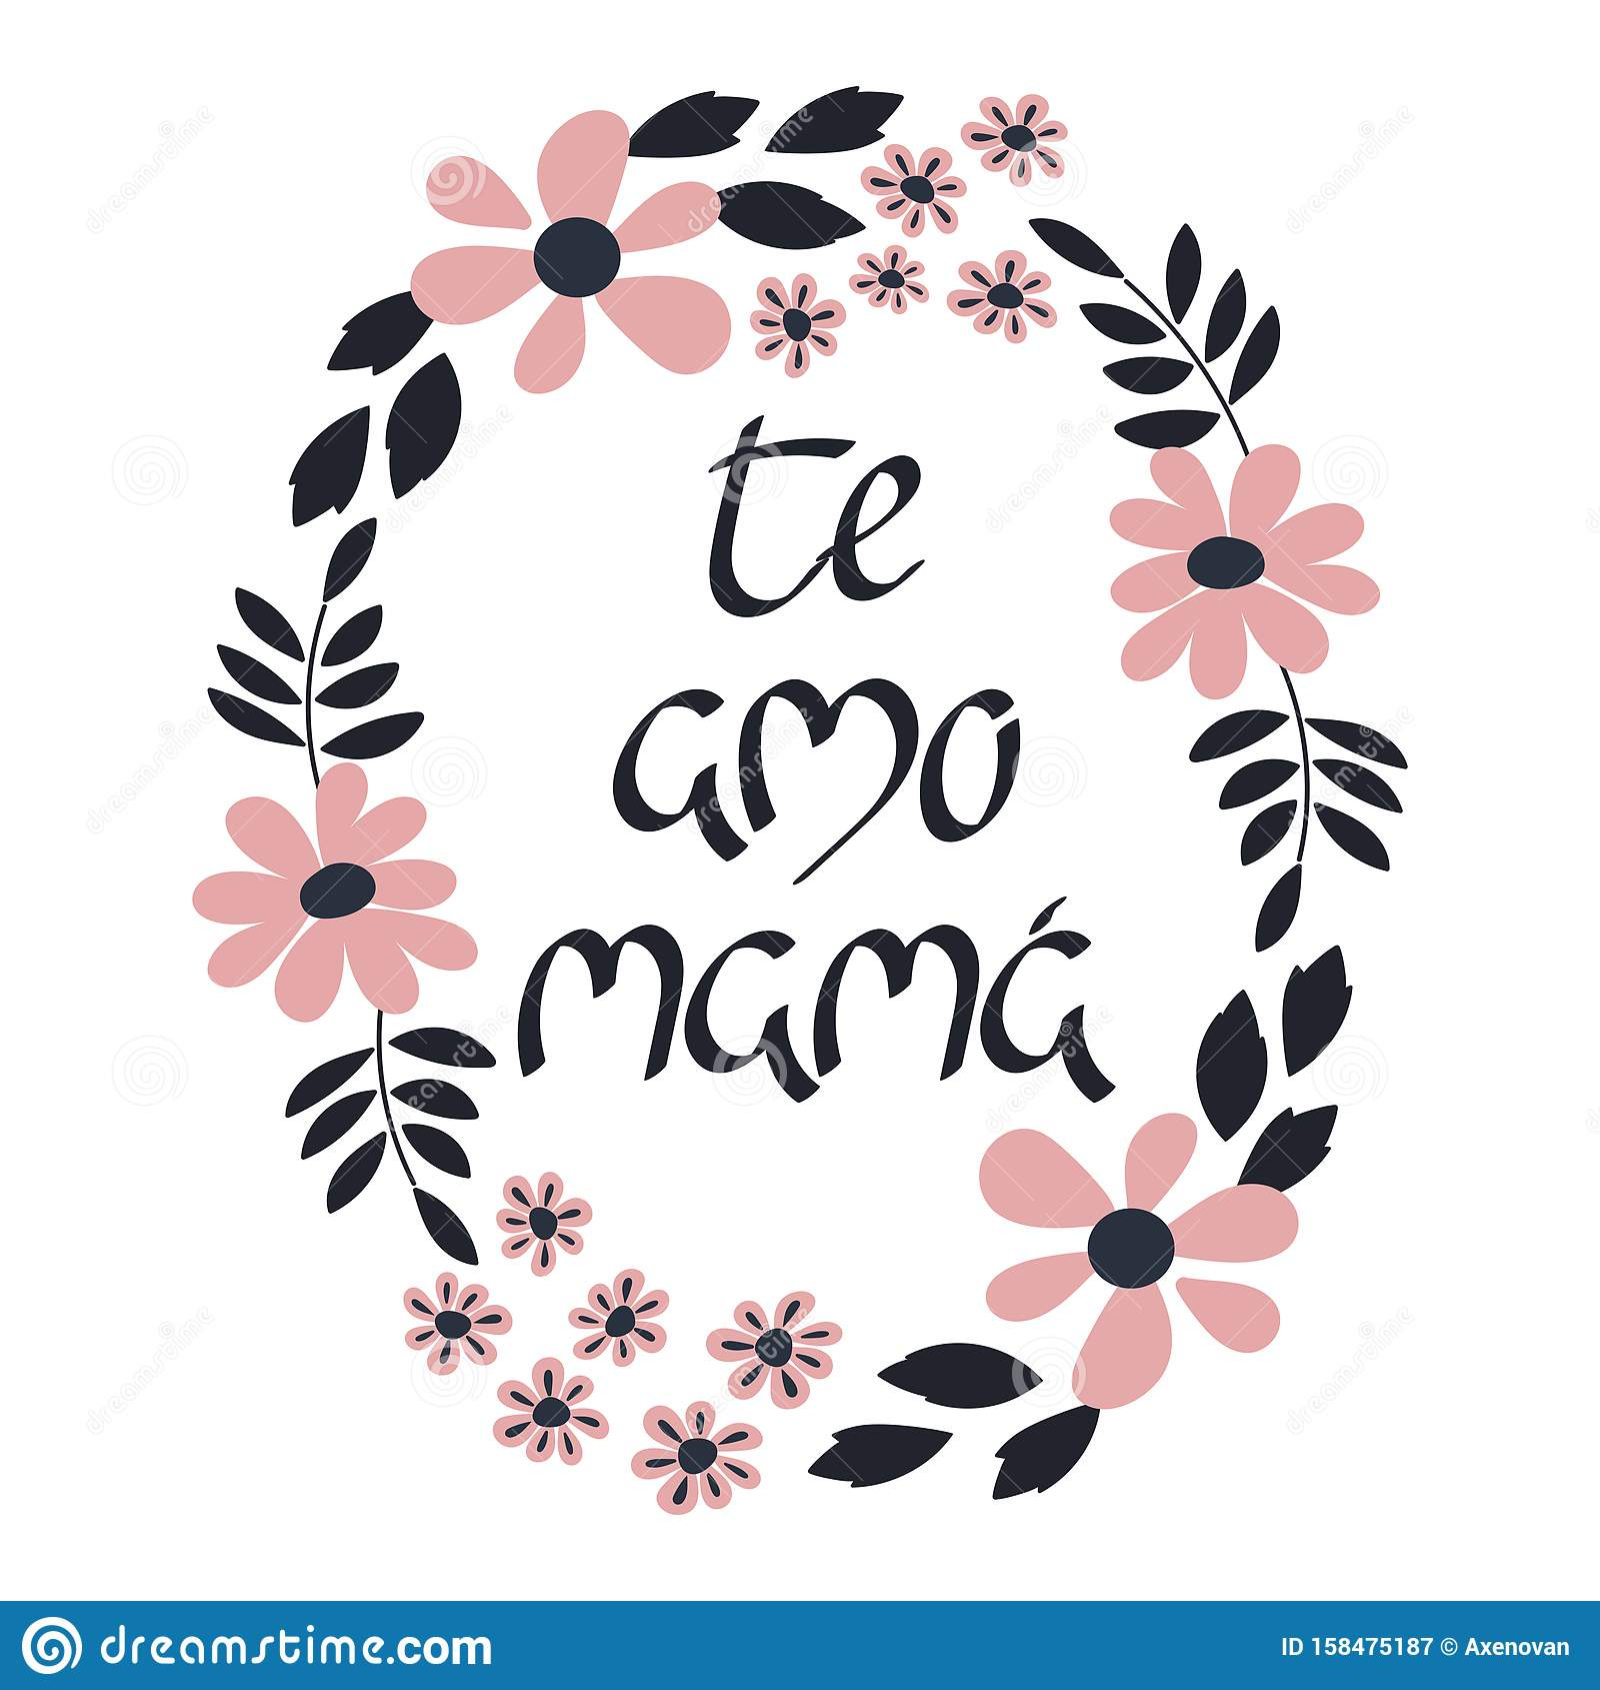 I Love You Mom In Spanish. Te Amo Mama, Lettering. Vector Illustration  Stock Illustration - Illustration of brush, card: 158475187